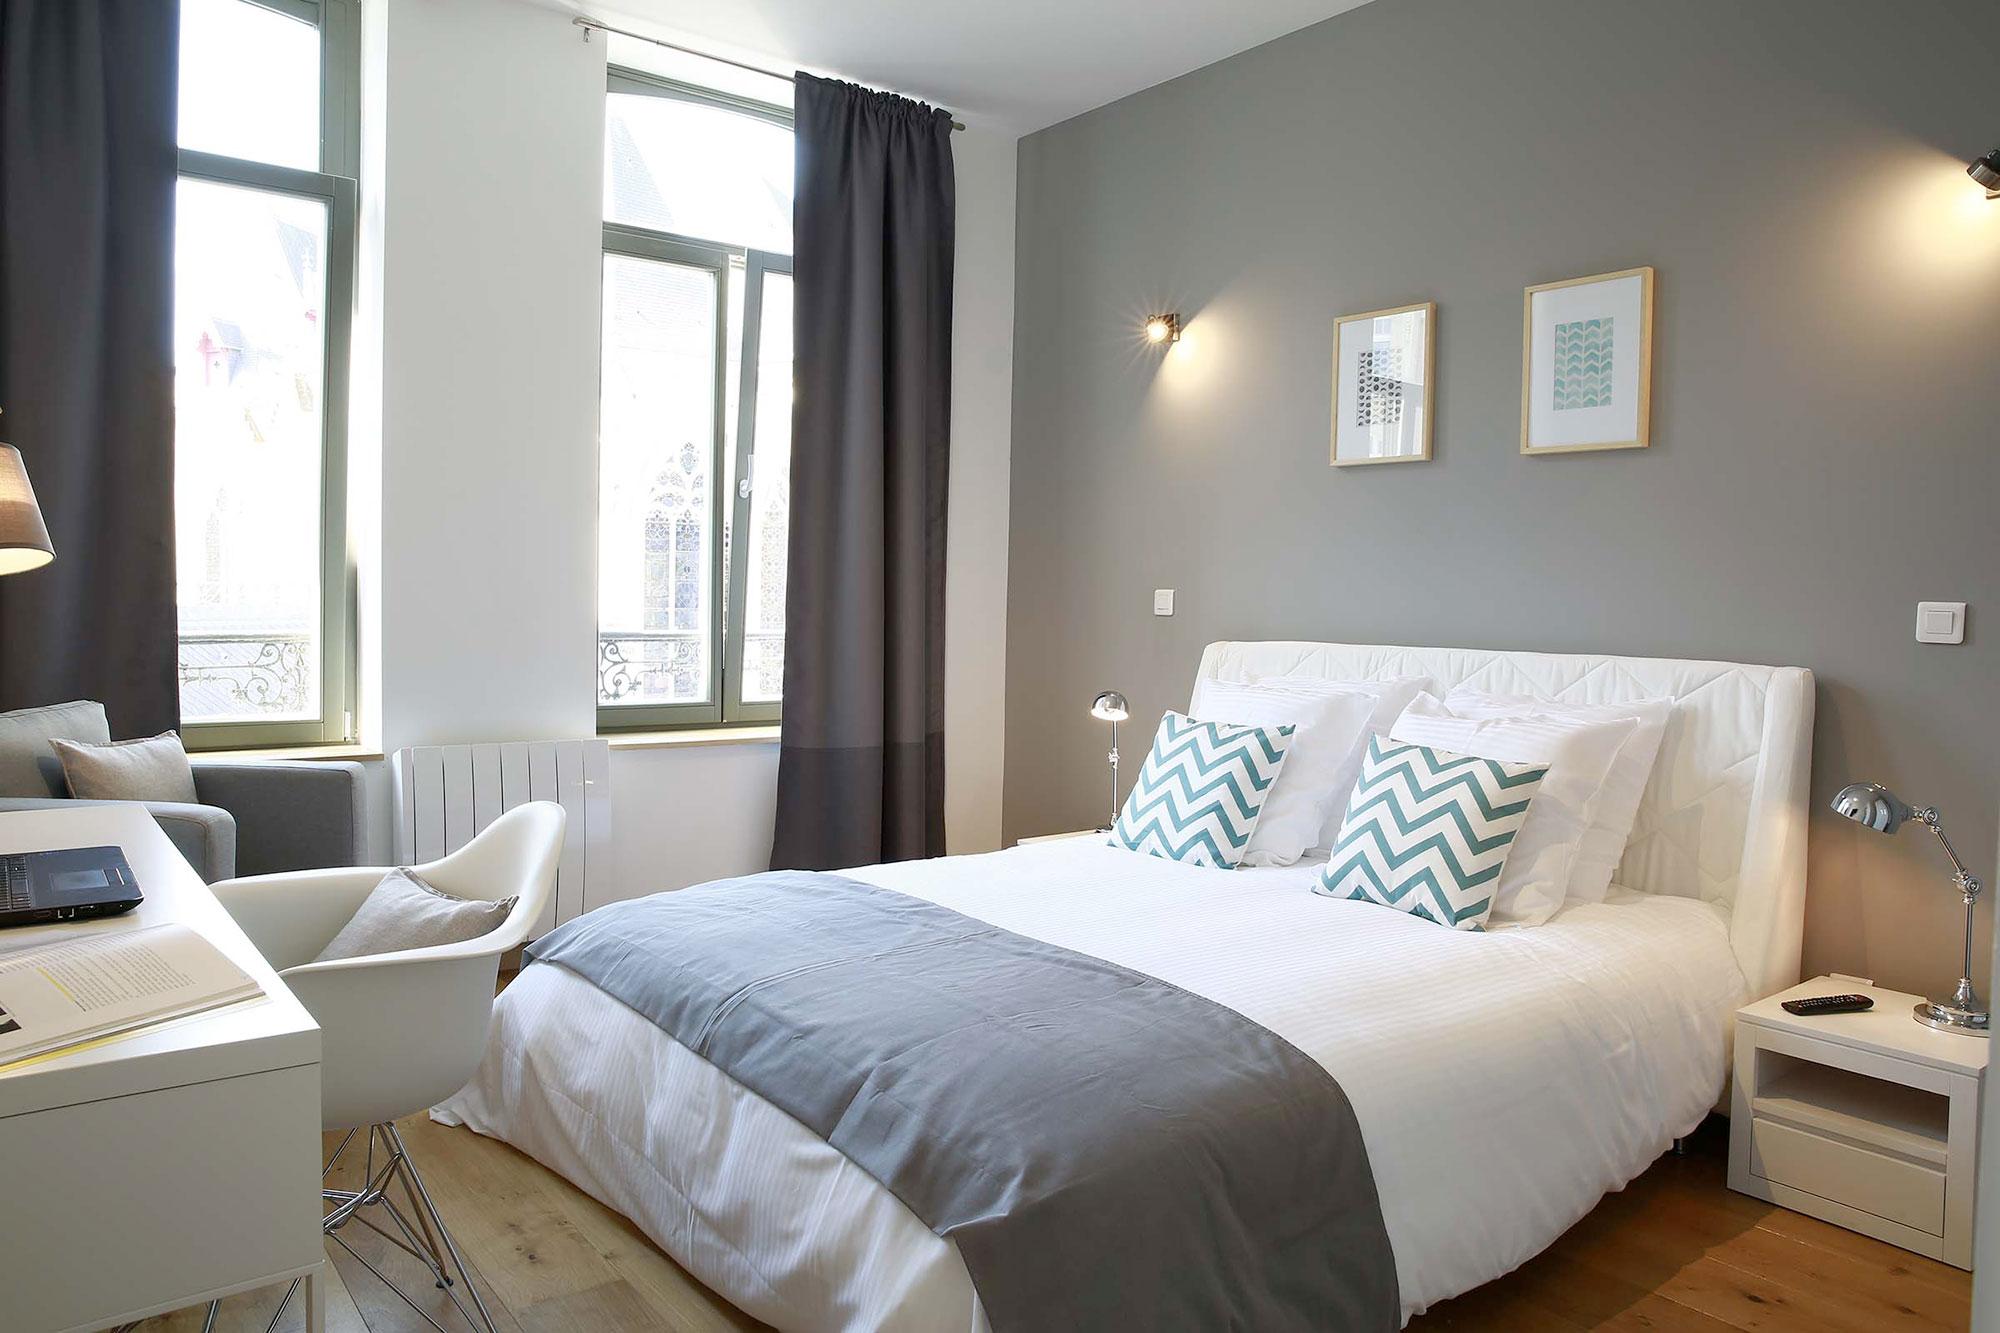 le vendome 19 flandres appart h tel lille. Black Bedroom Furniture Sets. Home Design Ideas